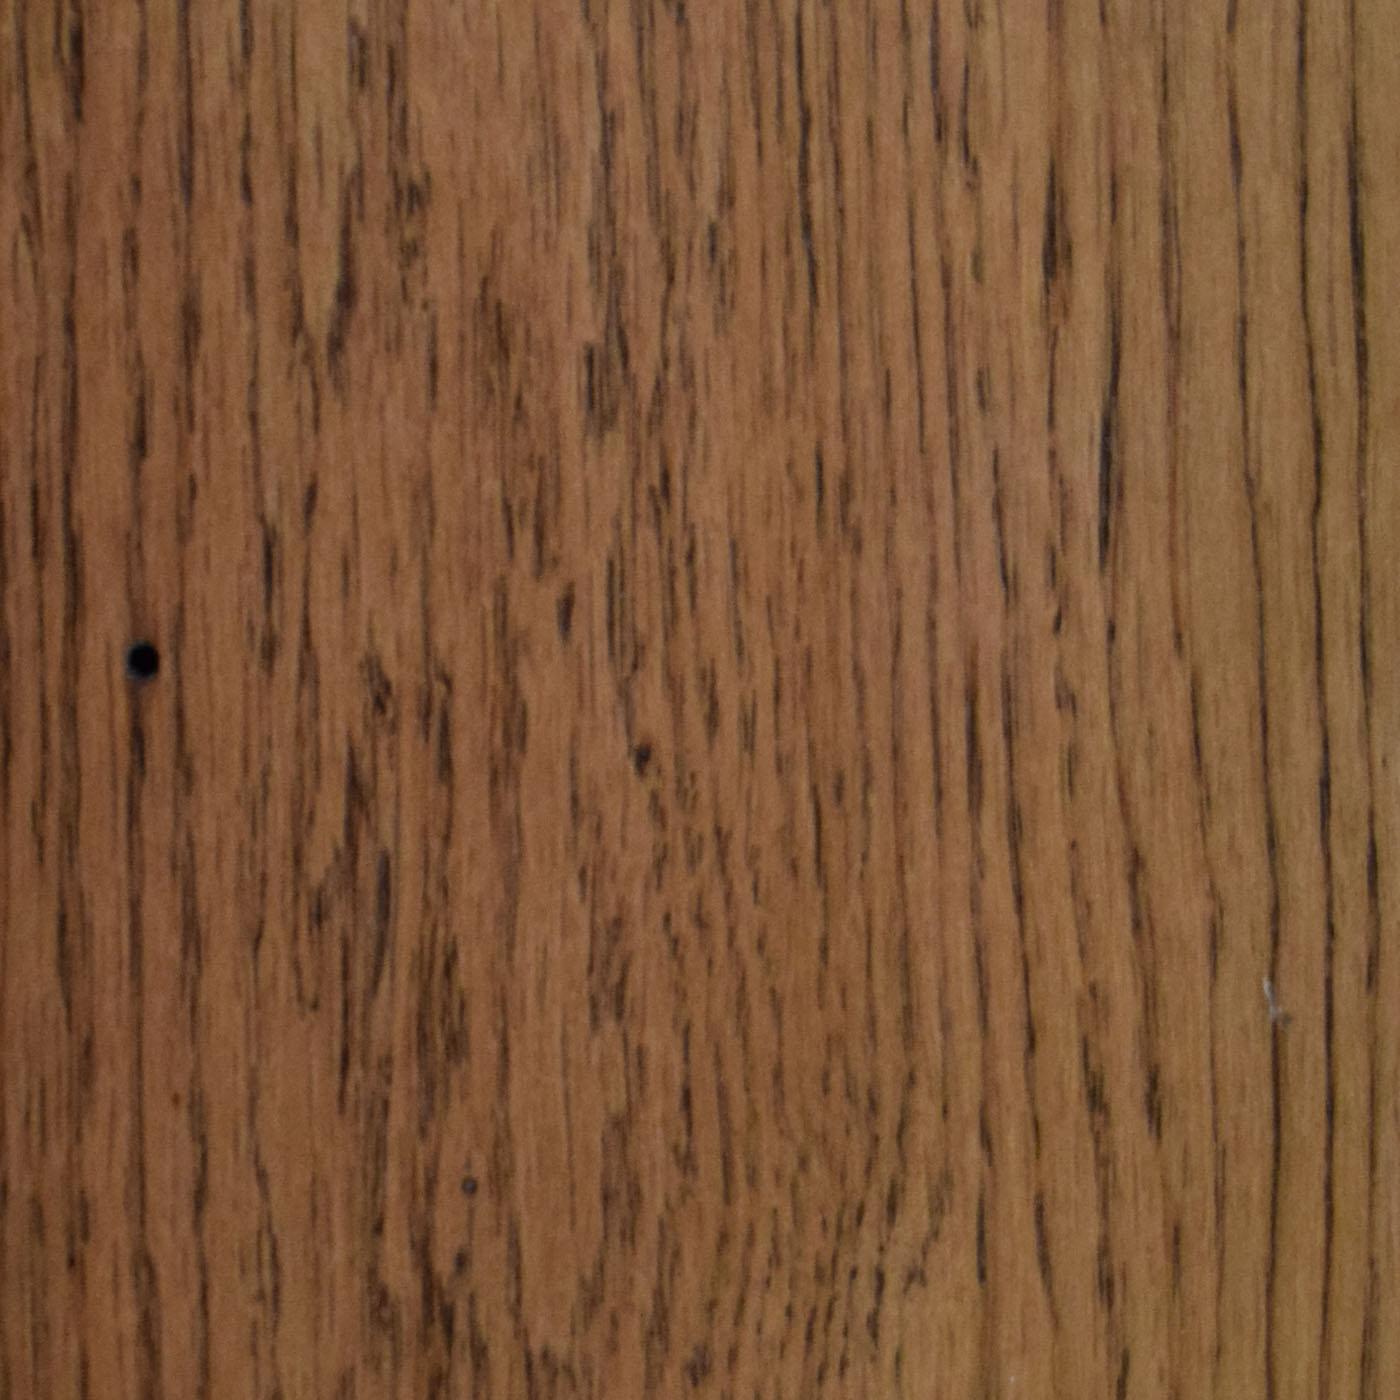 Reclaimed Oak Smooth - Jamestown - Wellborn + Wright